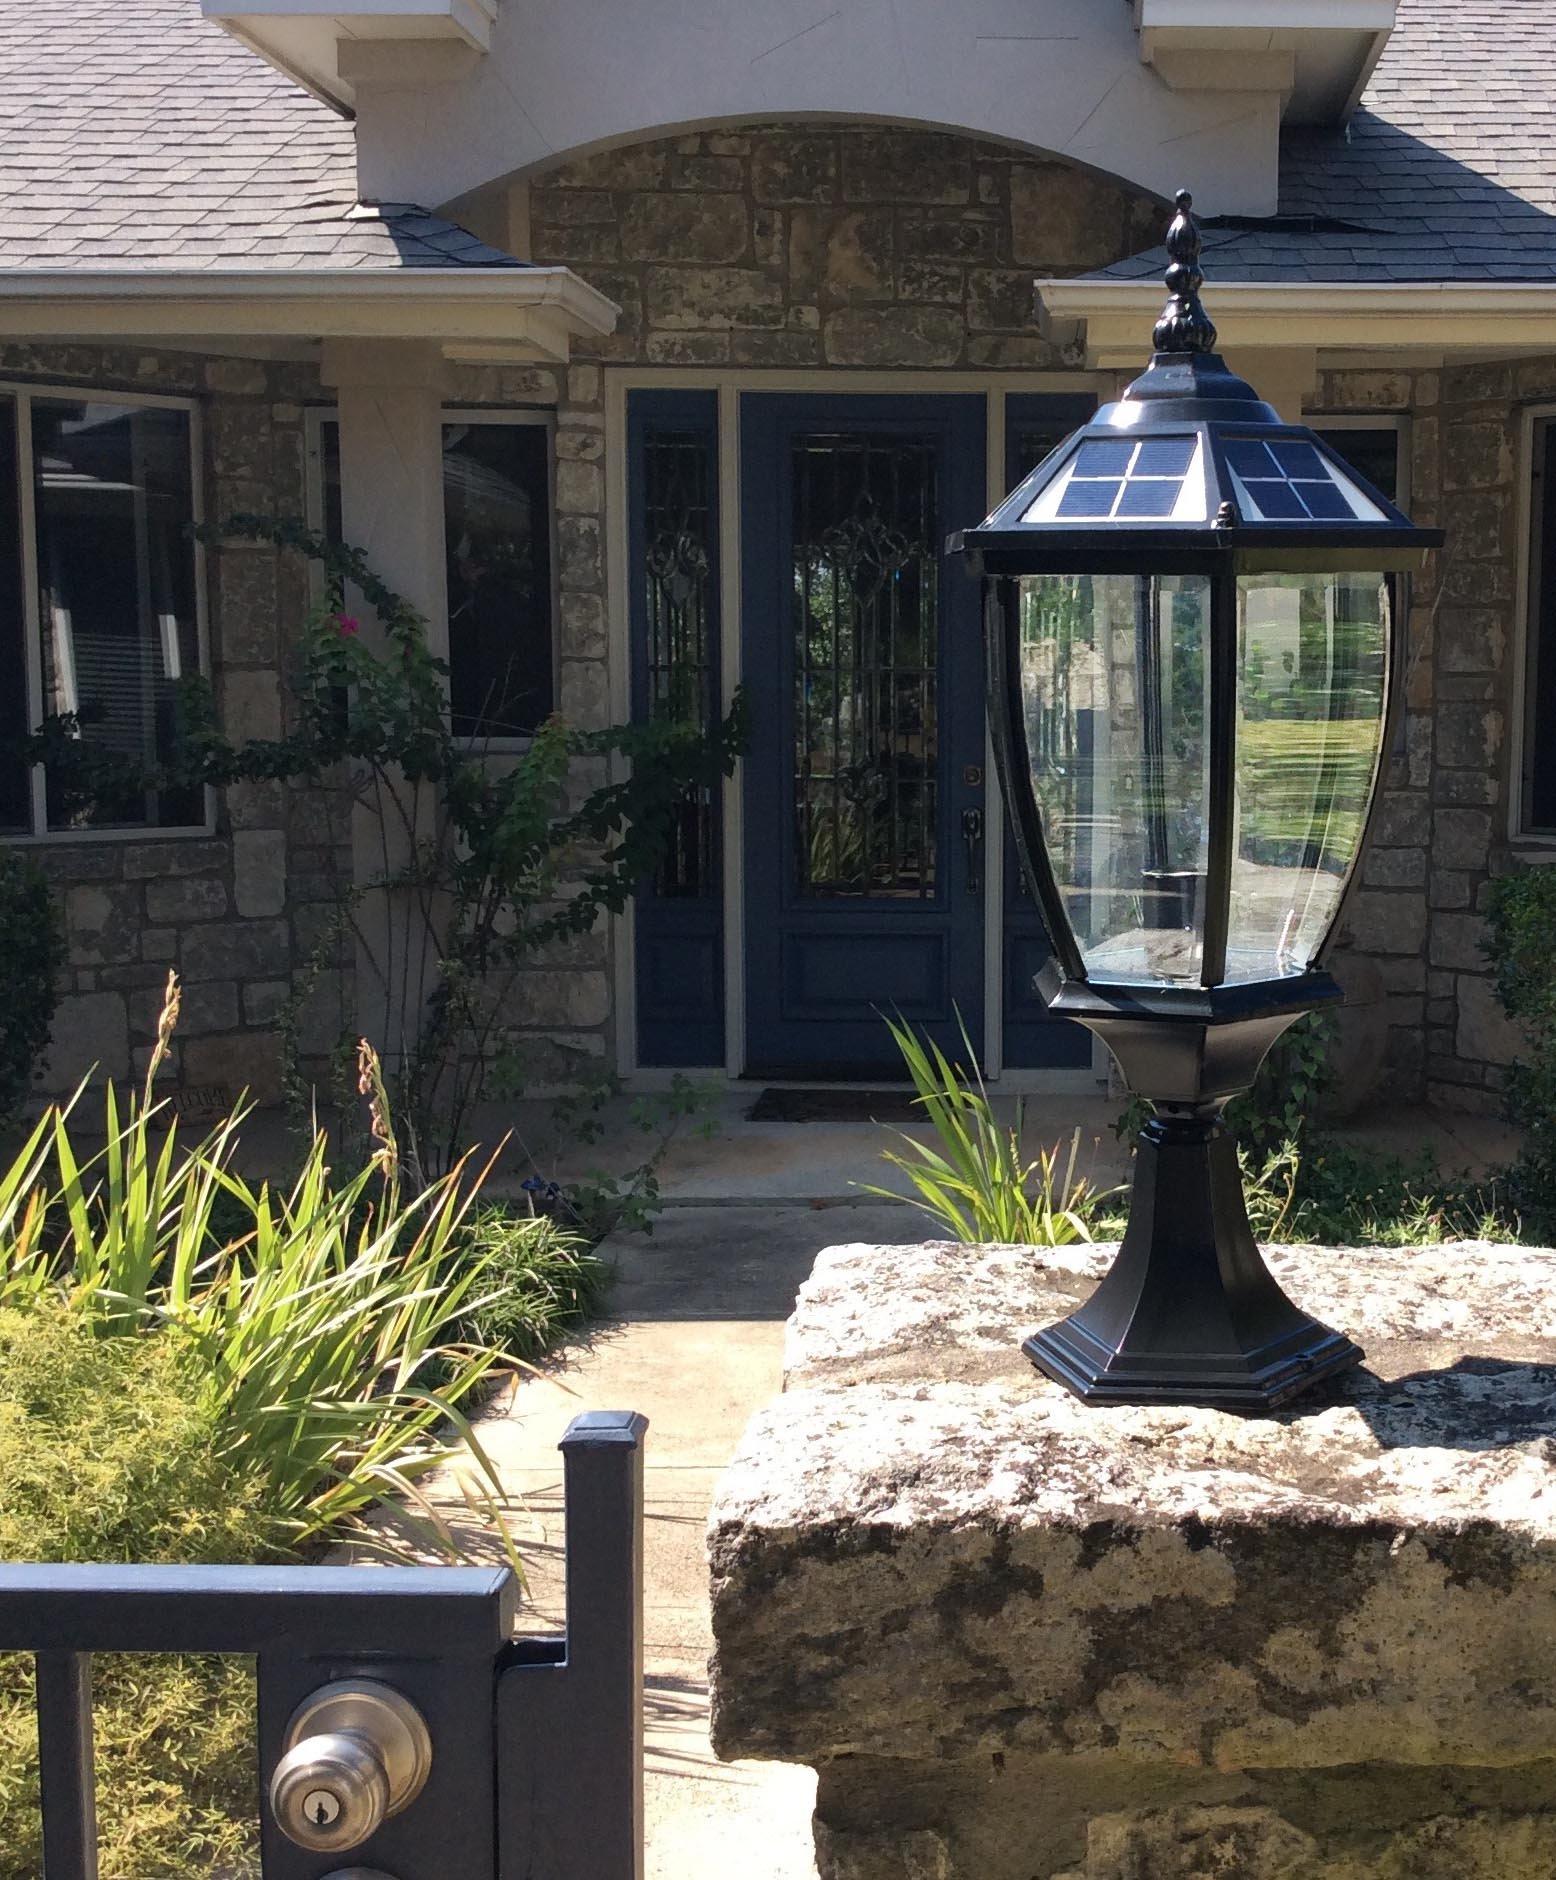 The Round Extra Large Solar Post Cap Lights or Solar Pillar, Diameter: 9.8 Inch; Height: 20.5 Inch. Solar Powered Post Caps. Elegantly Designed Solar Light Post Caps (New Metal Black) by Smart Light (Image #4)